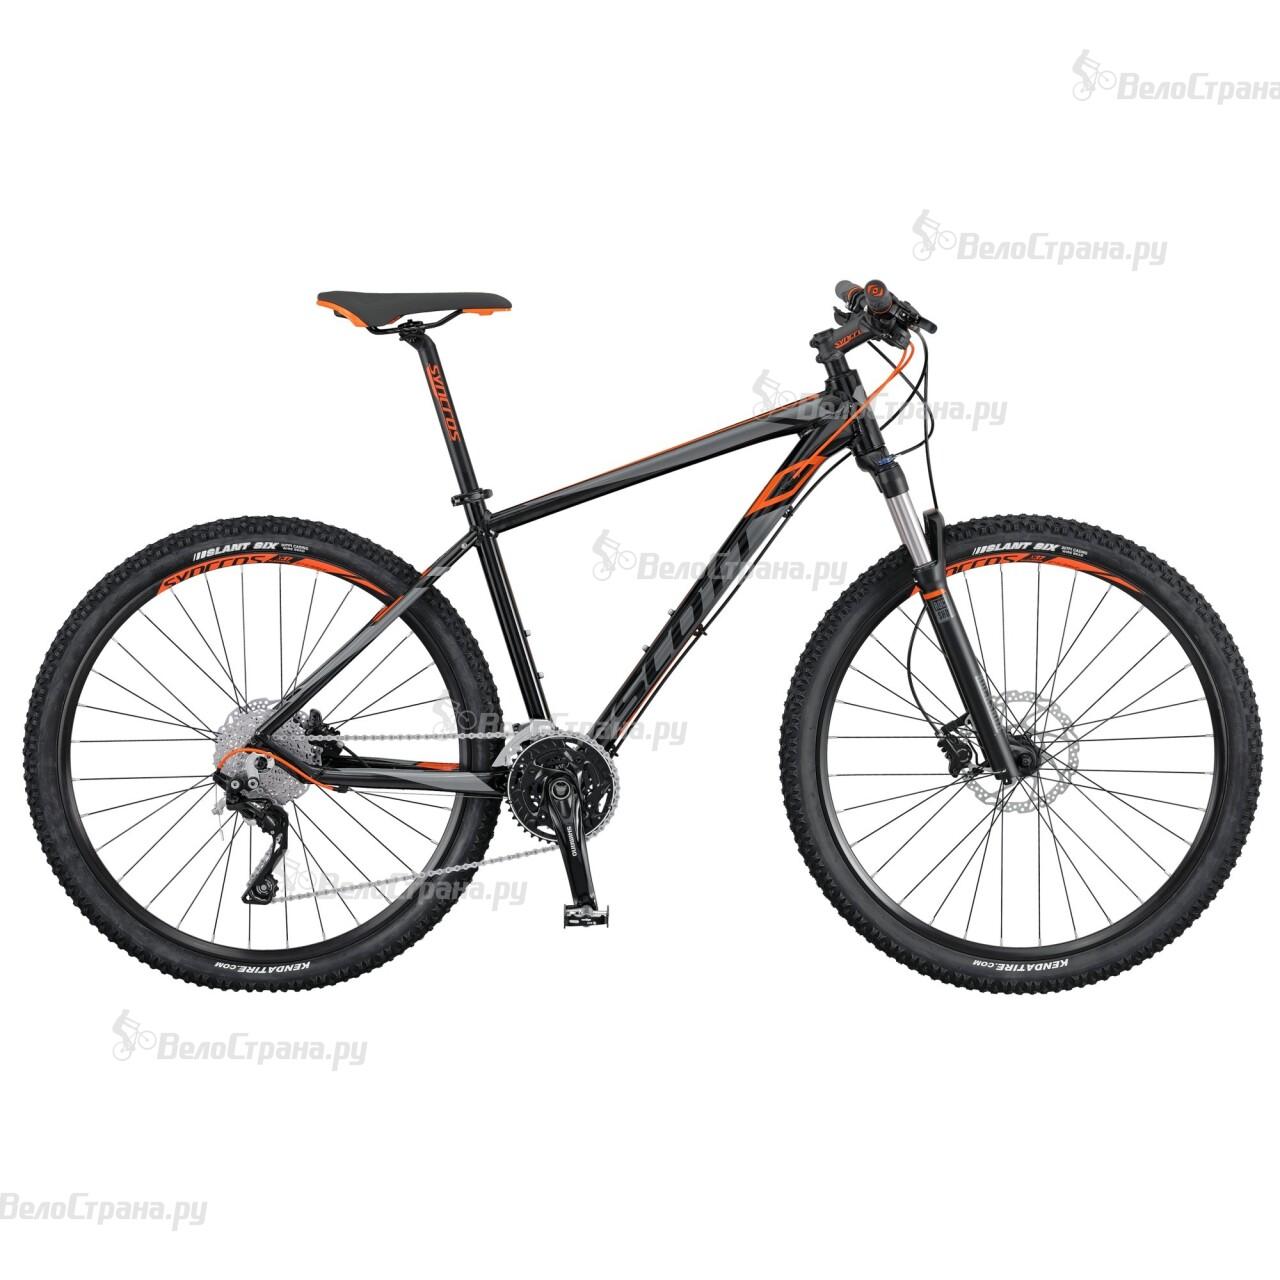 Велосипед Scott Aspect 910 (2016) велосипед scott aspect 700 27 5 2016